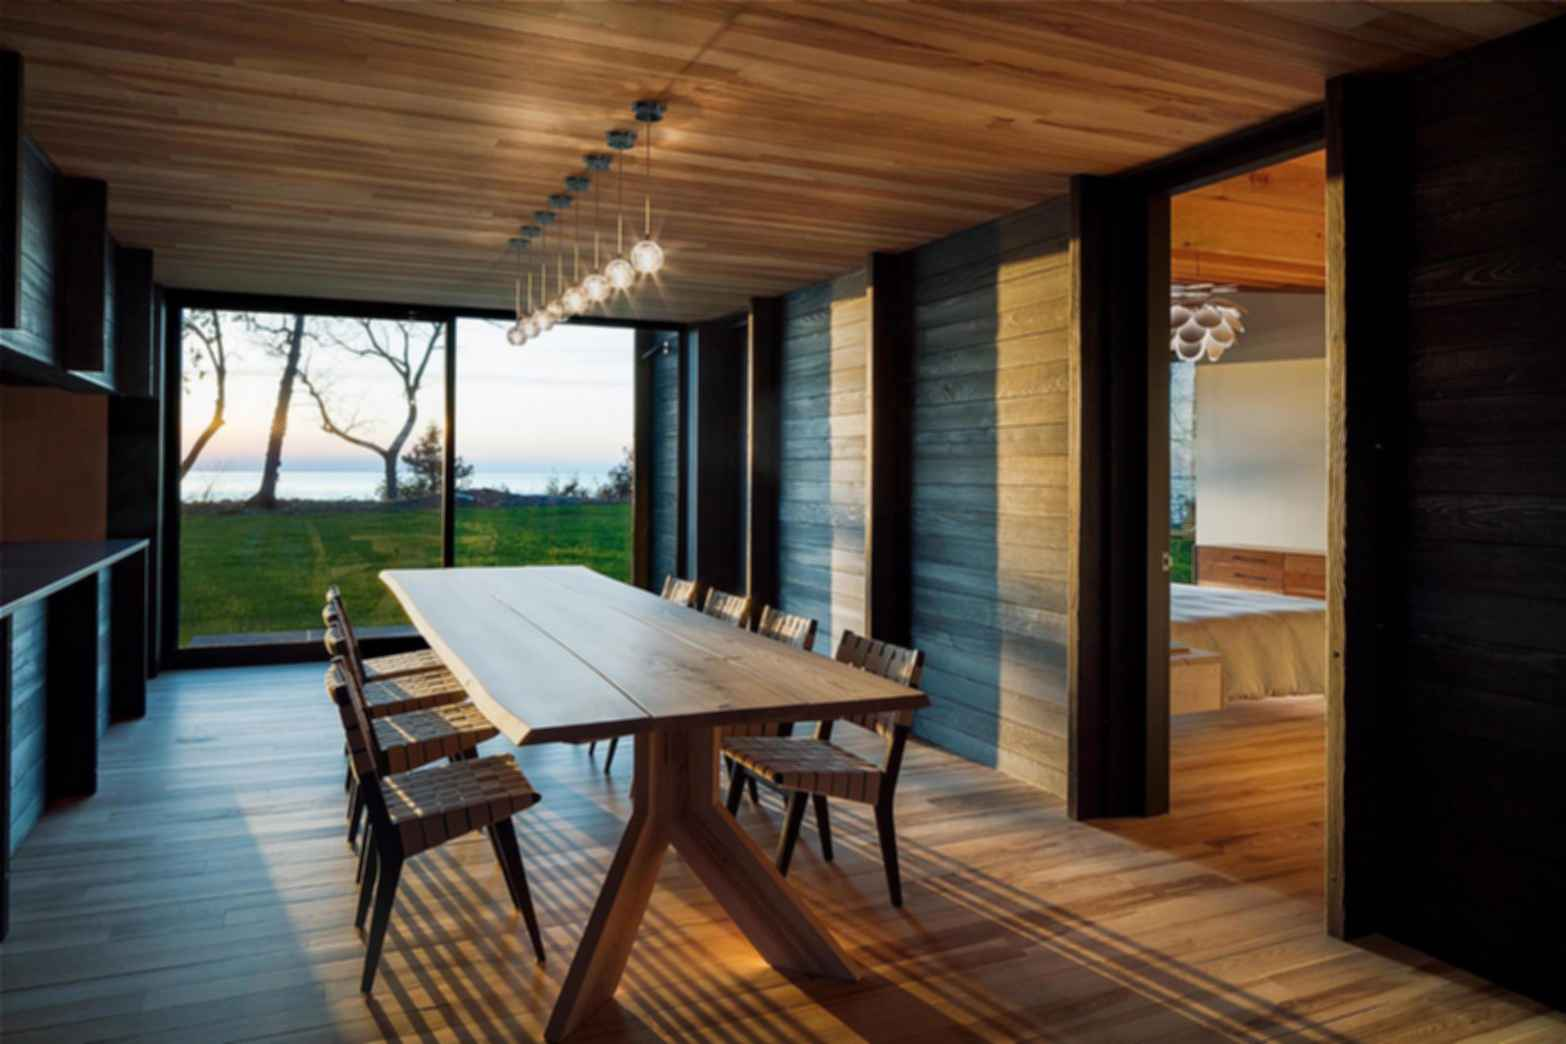 Michigan Lake House - Interior